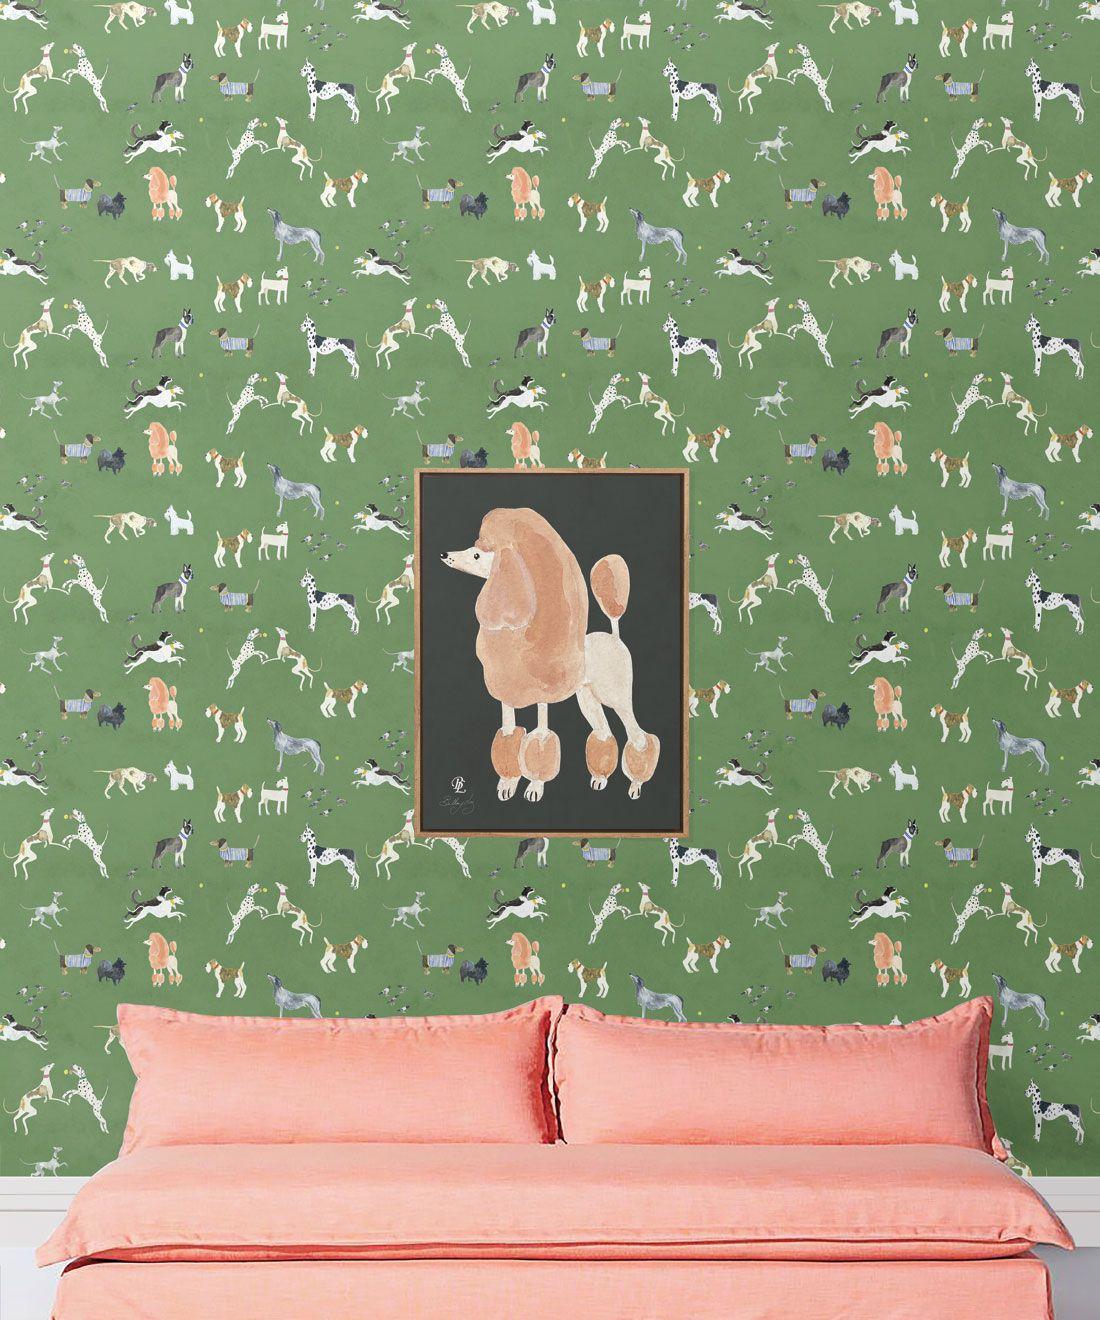 Doggies Wallpaper •Dog Wallpaper •Green • insitu with sofa